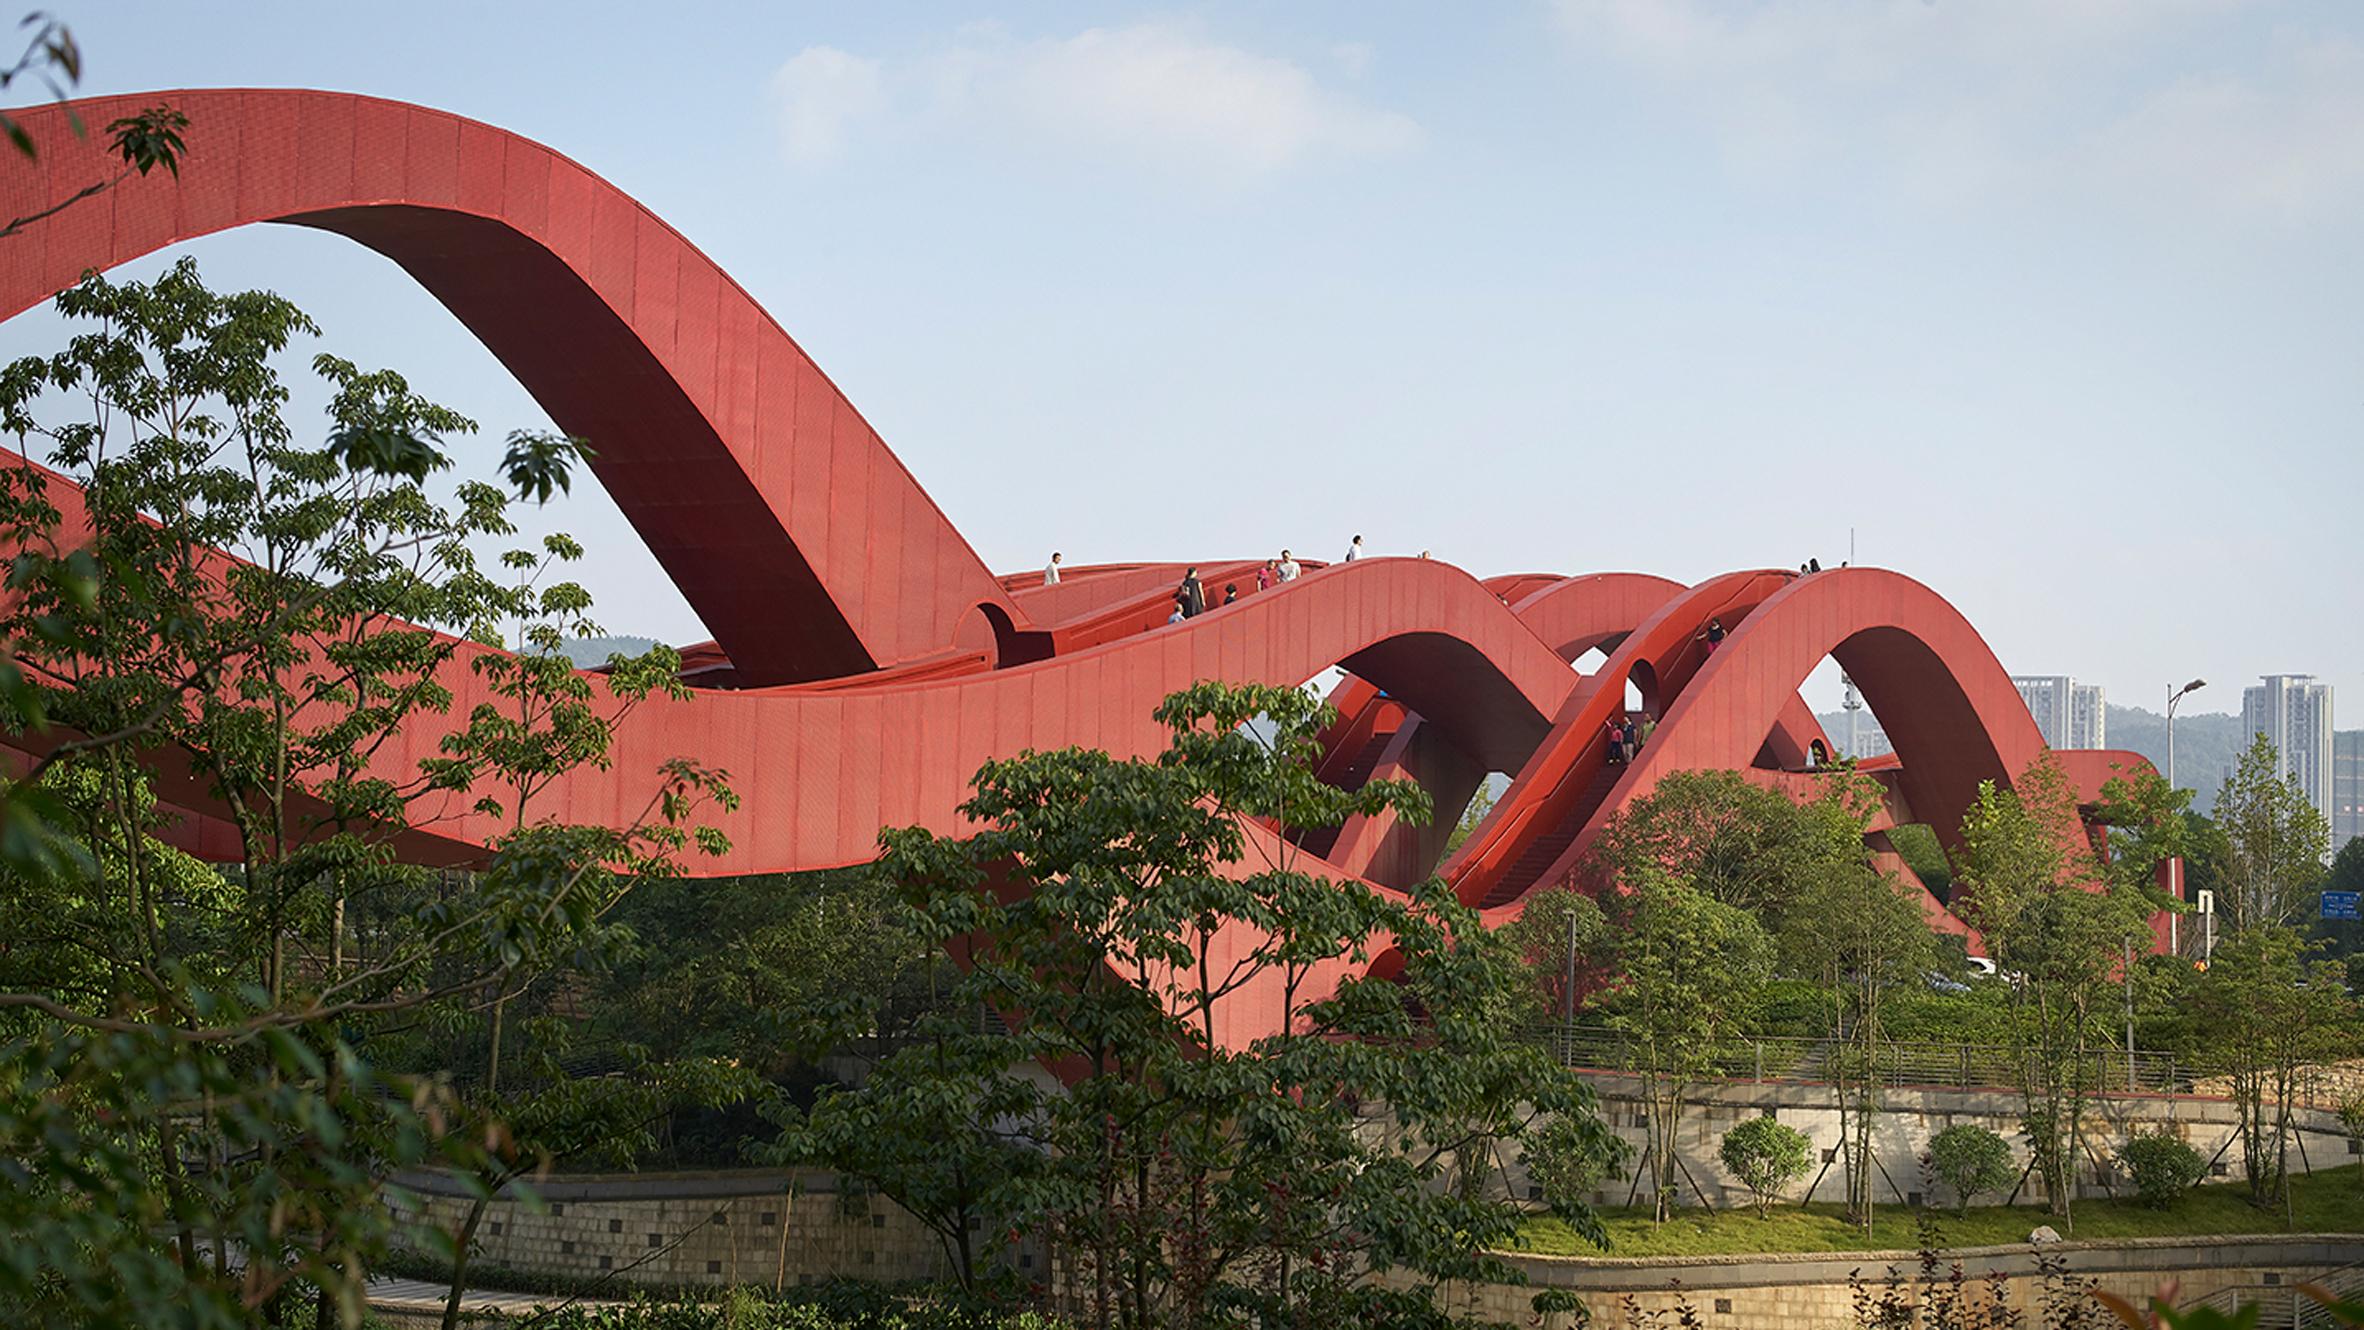 lucky-knot-pedestrian-bridge-infrastructure-design-architecture-next-architects-meixi-lake-china_dezeen_1704_col_0